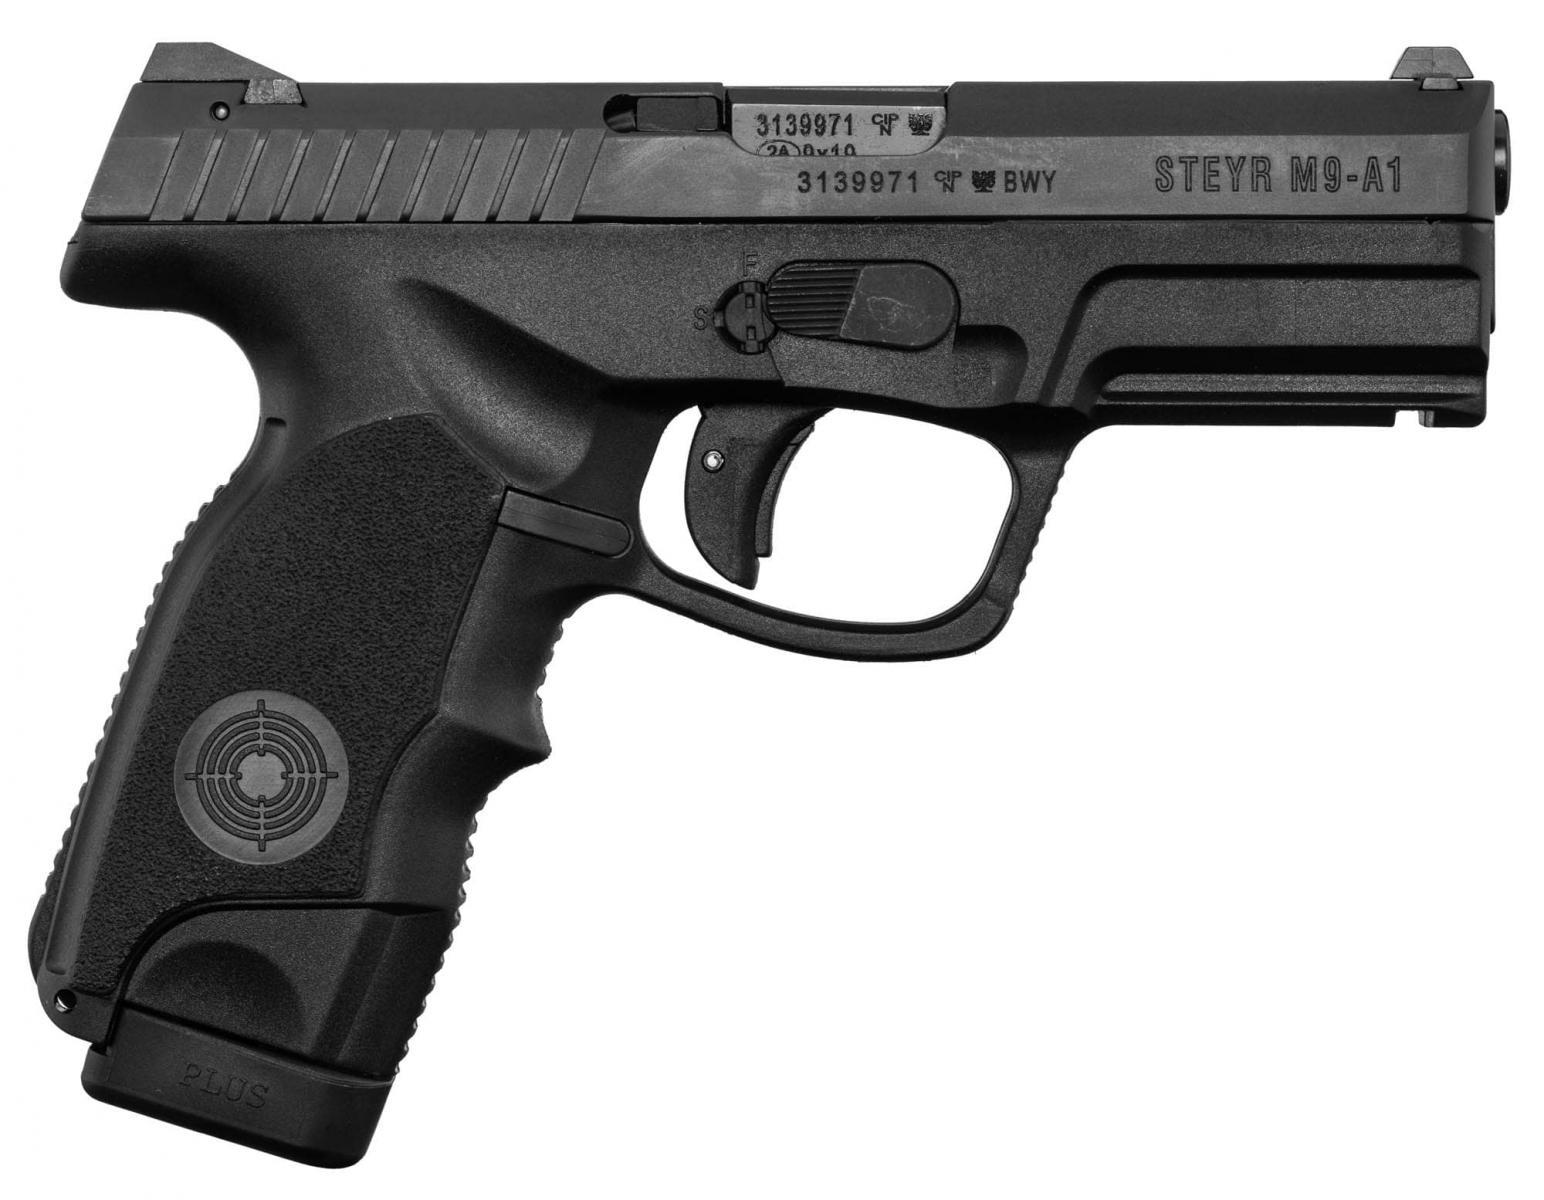 Pistolet STEYR M9 POLICE OFFRE SPECIALE